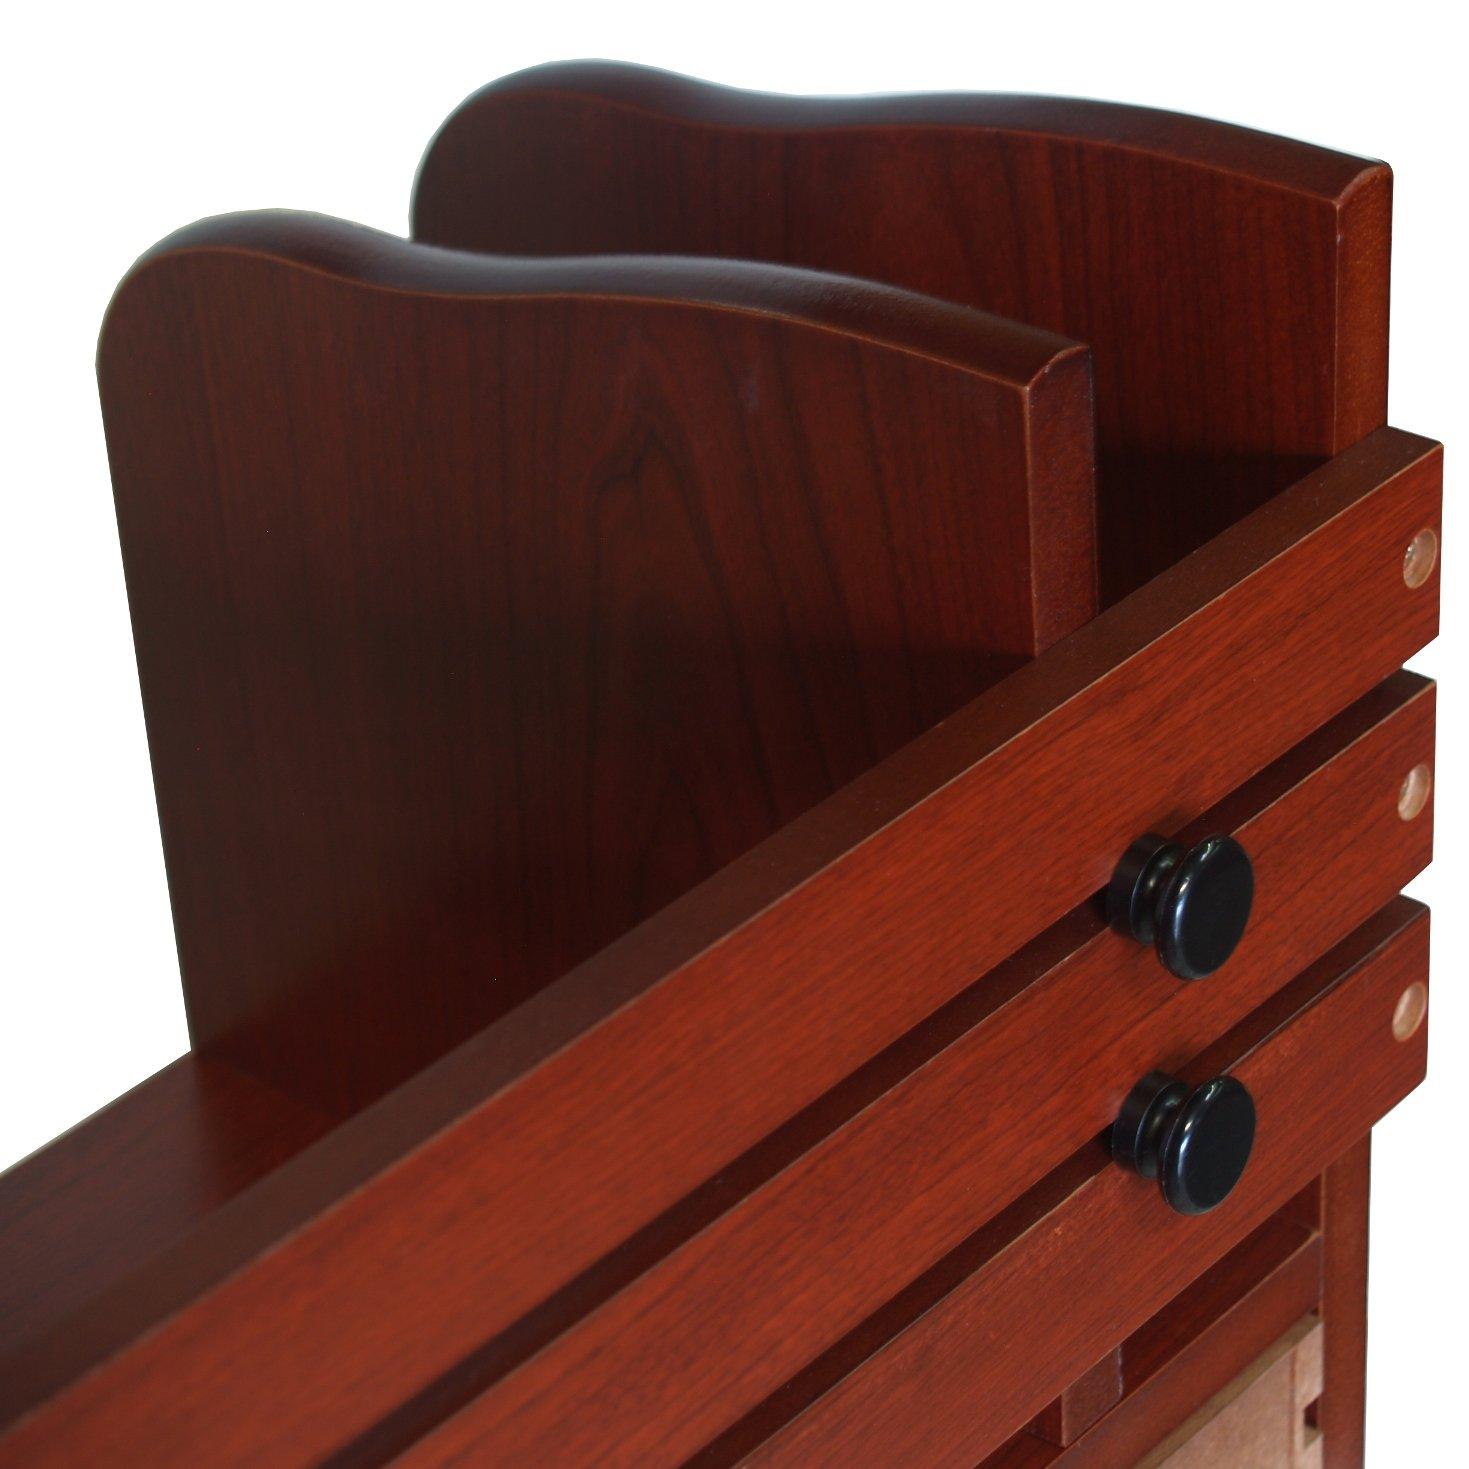 24 W x 8 D x 12 H Reddish Proman Products Renaissance Desktop Red Walnut Wood Book Rack Adjustable Drawer